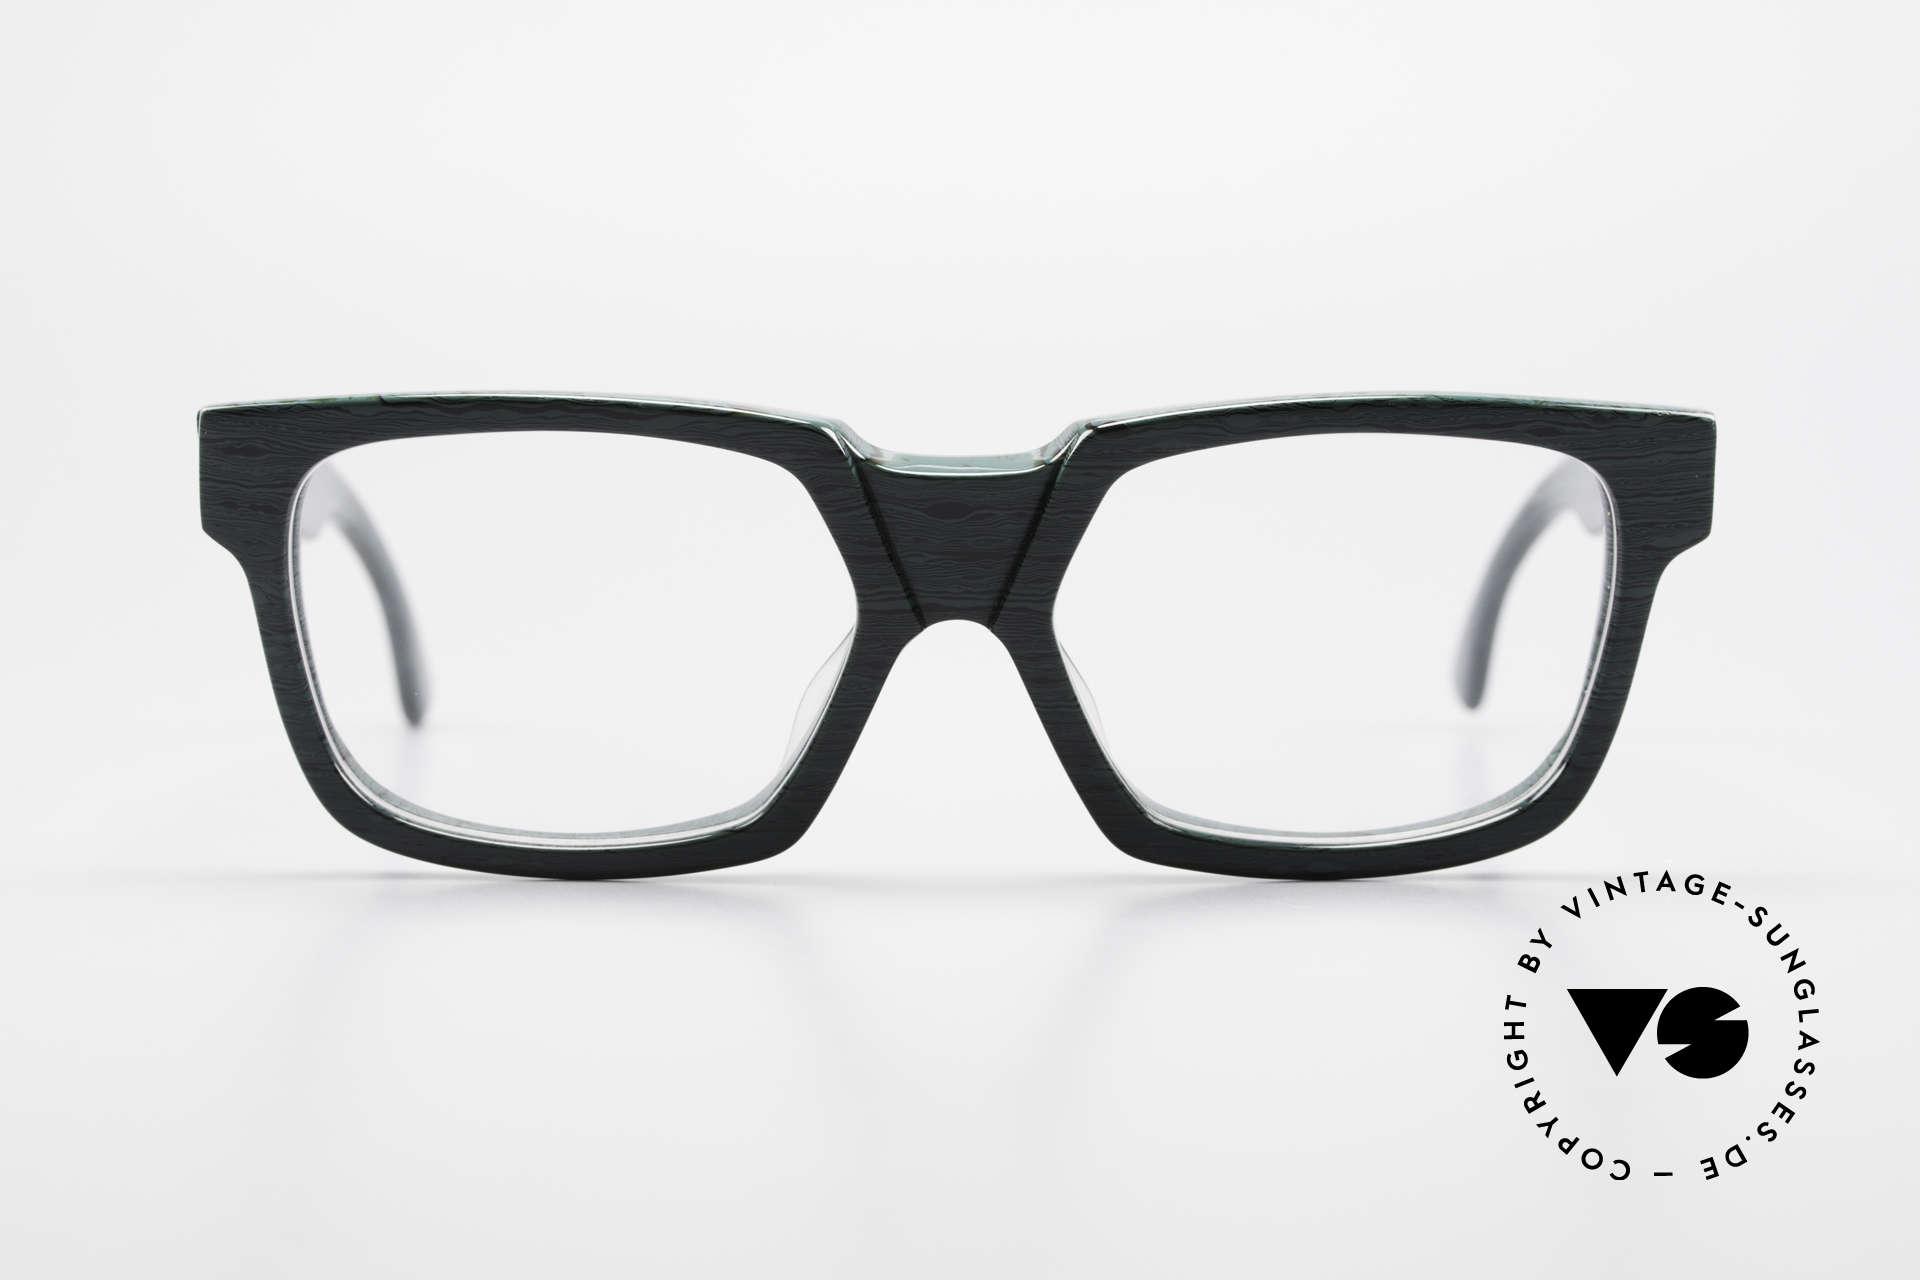 Alain Mikli 0143 / 285 Striking 1980's Eyeglasses, striking frame with very interesting pattern / color, Made for Men and Women